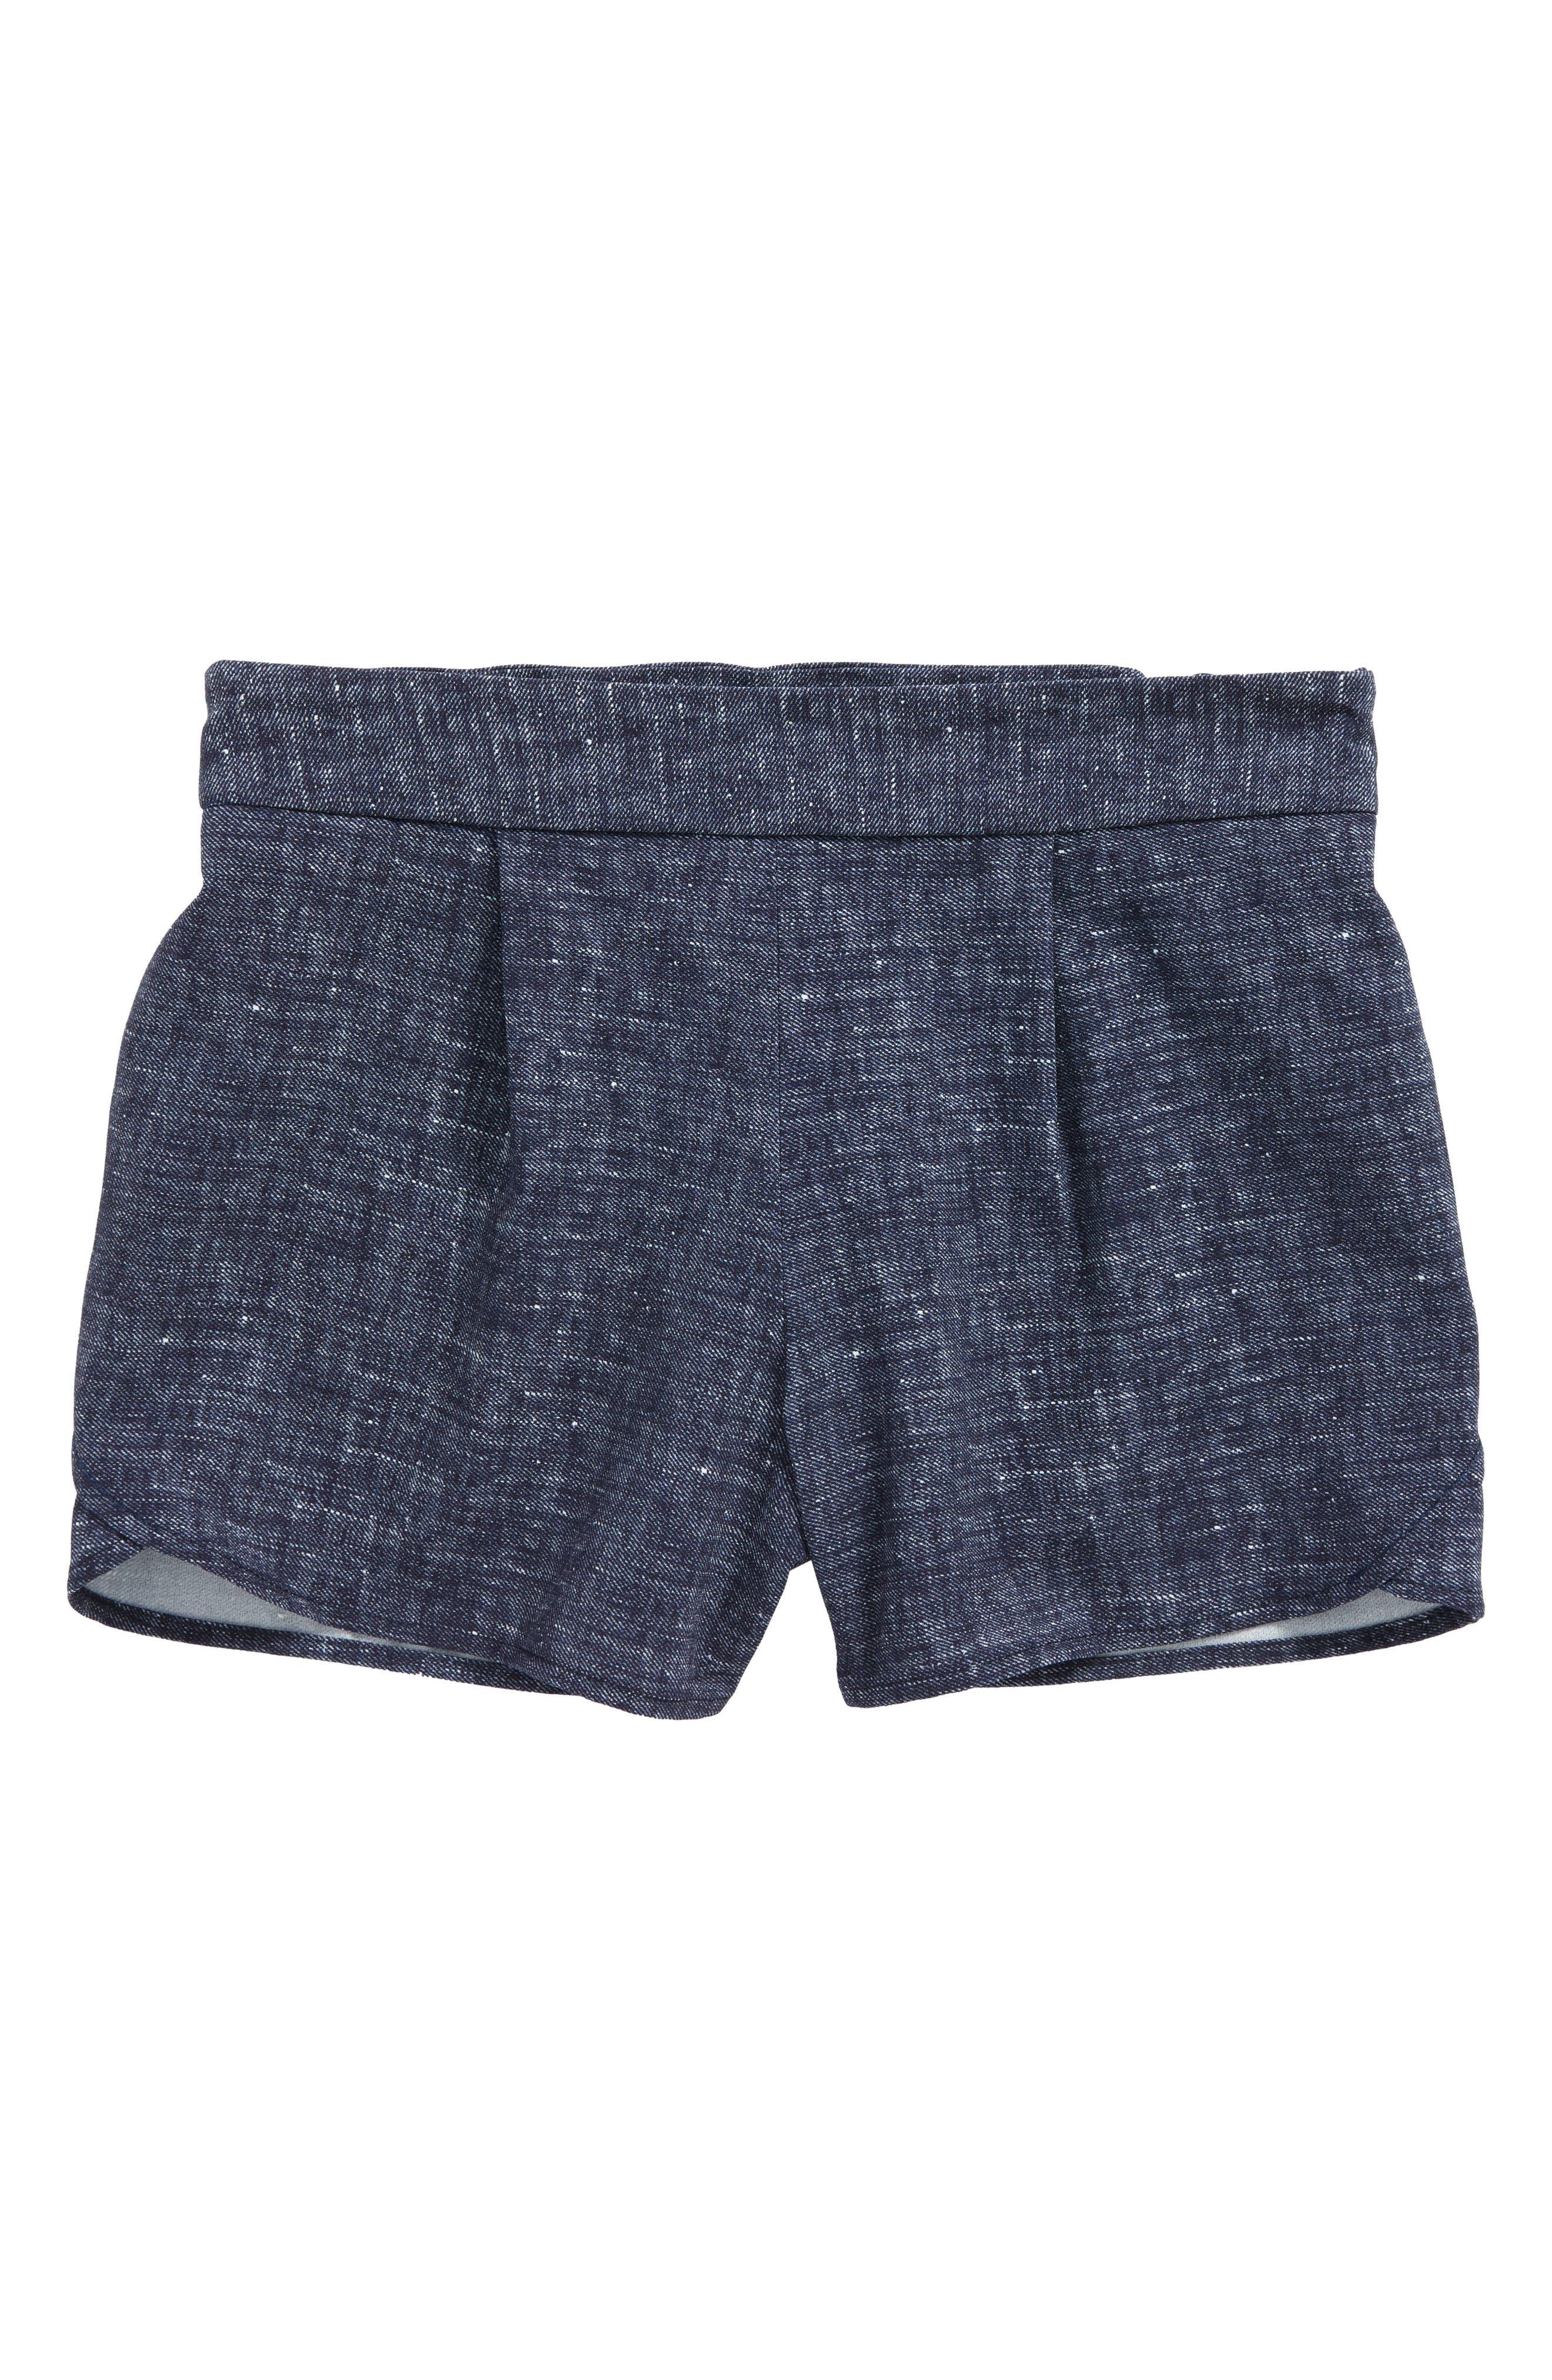 Petal Shorts,                         Main,                         color, Blue Multi